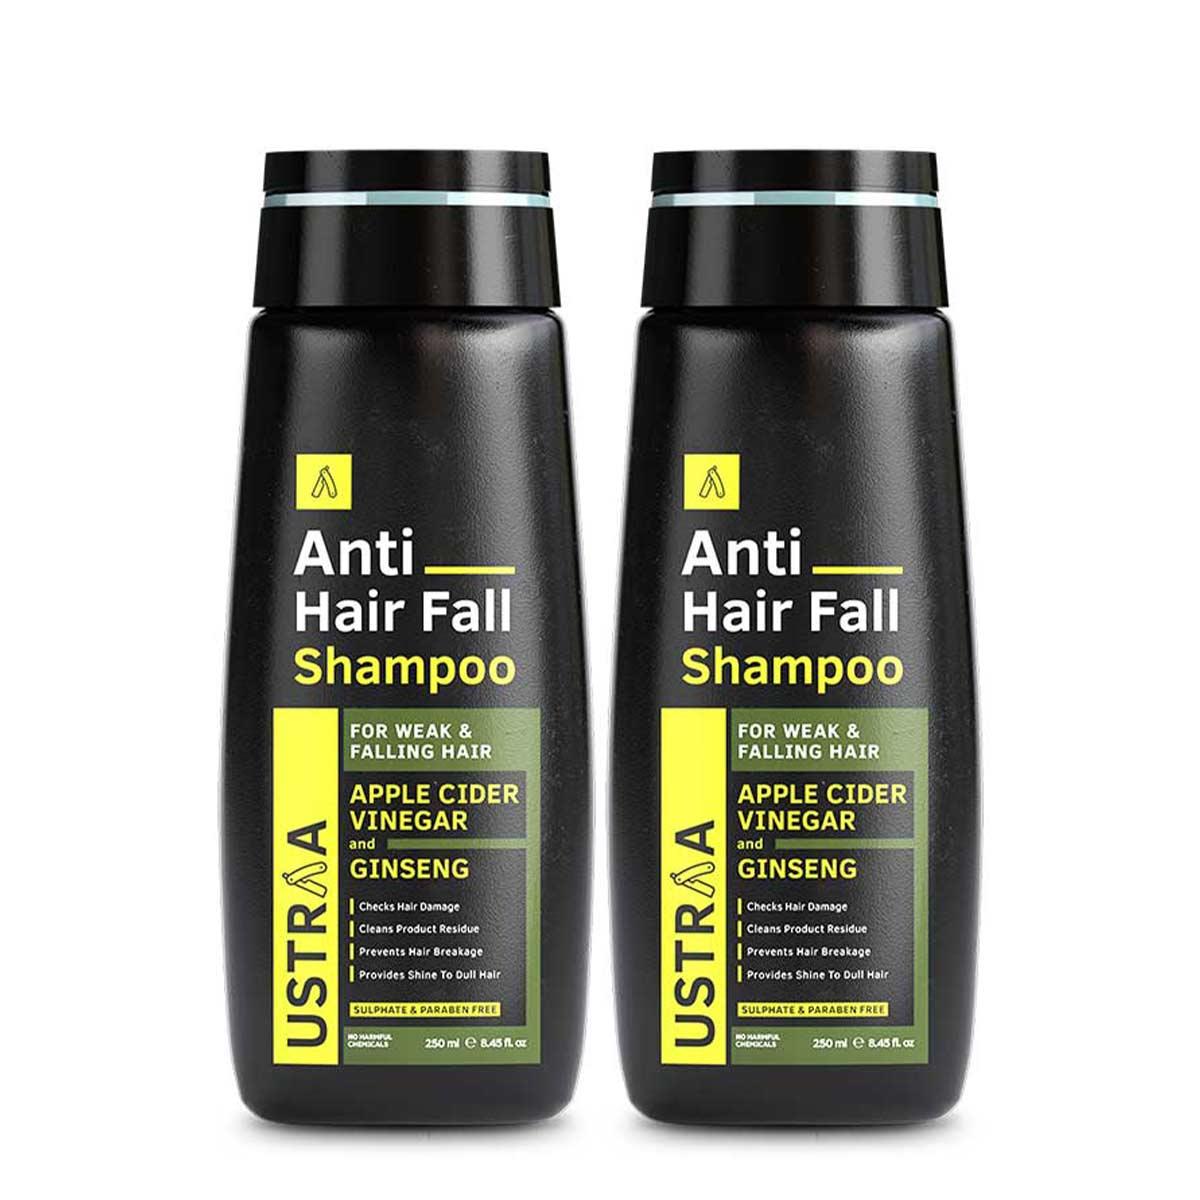 Ustraa Anti Hair Fall Shampoo for Men (250 ml), Set of 2: With Apple Cider Vinegar